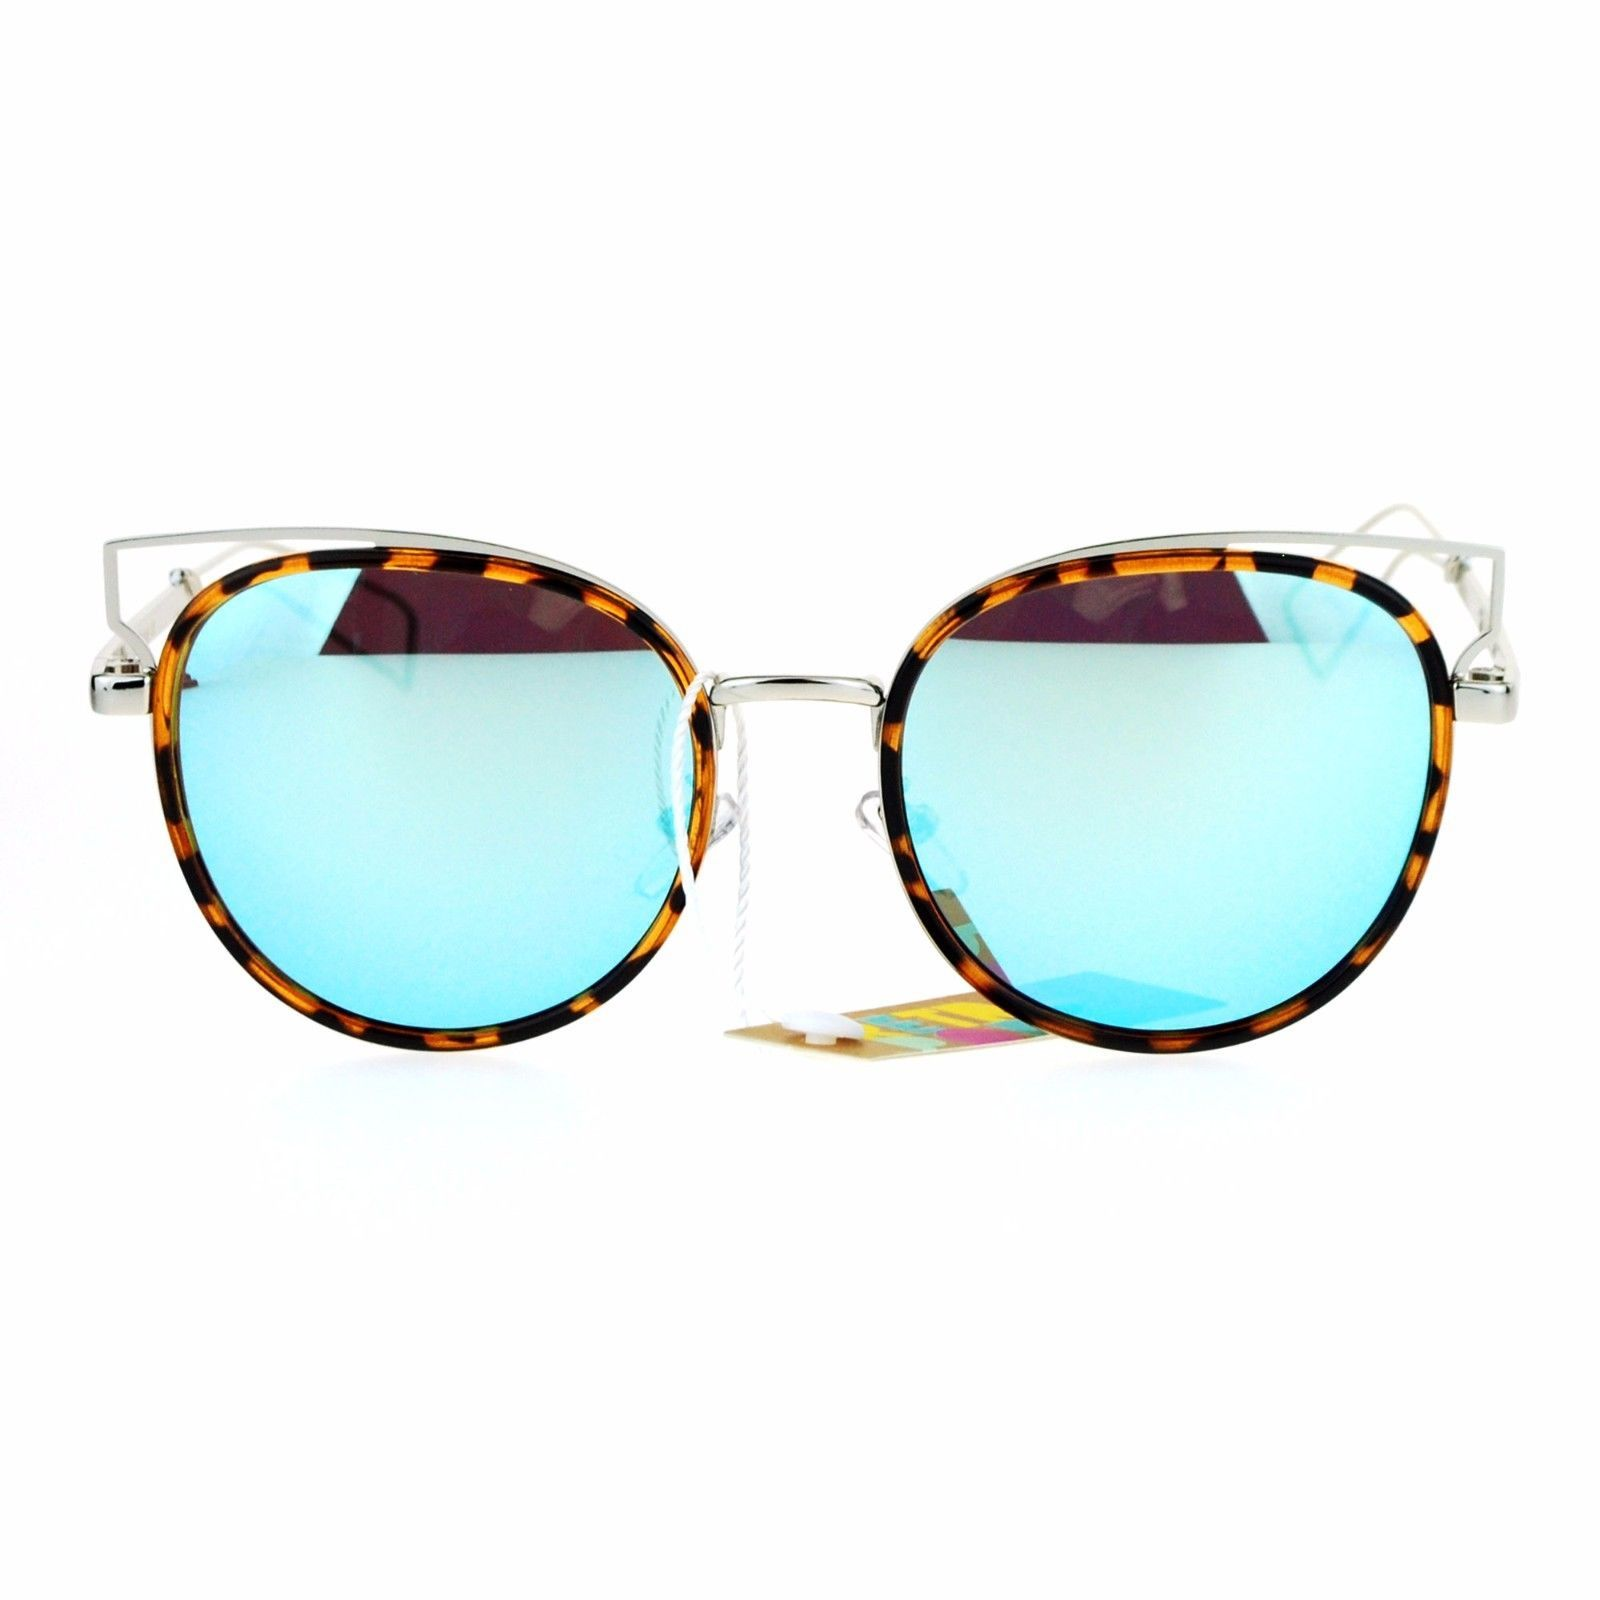 Womens Trendy Fashion Sunglasses Round Cateye Double Frame UV 400